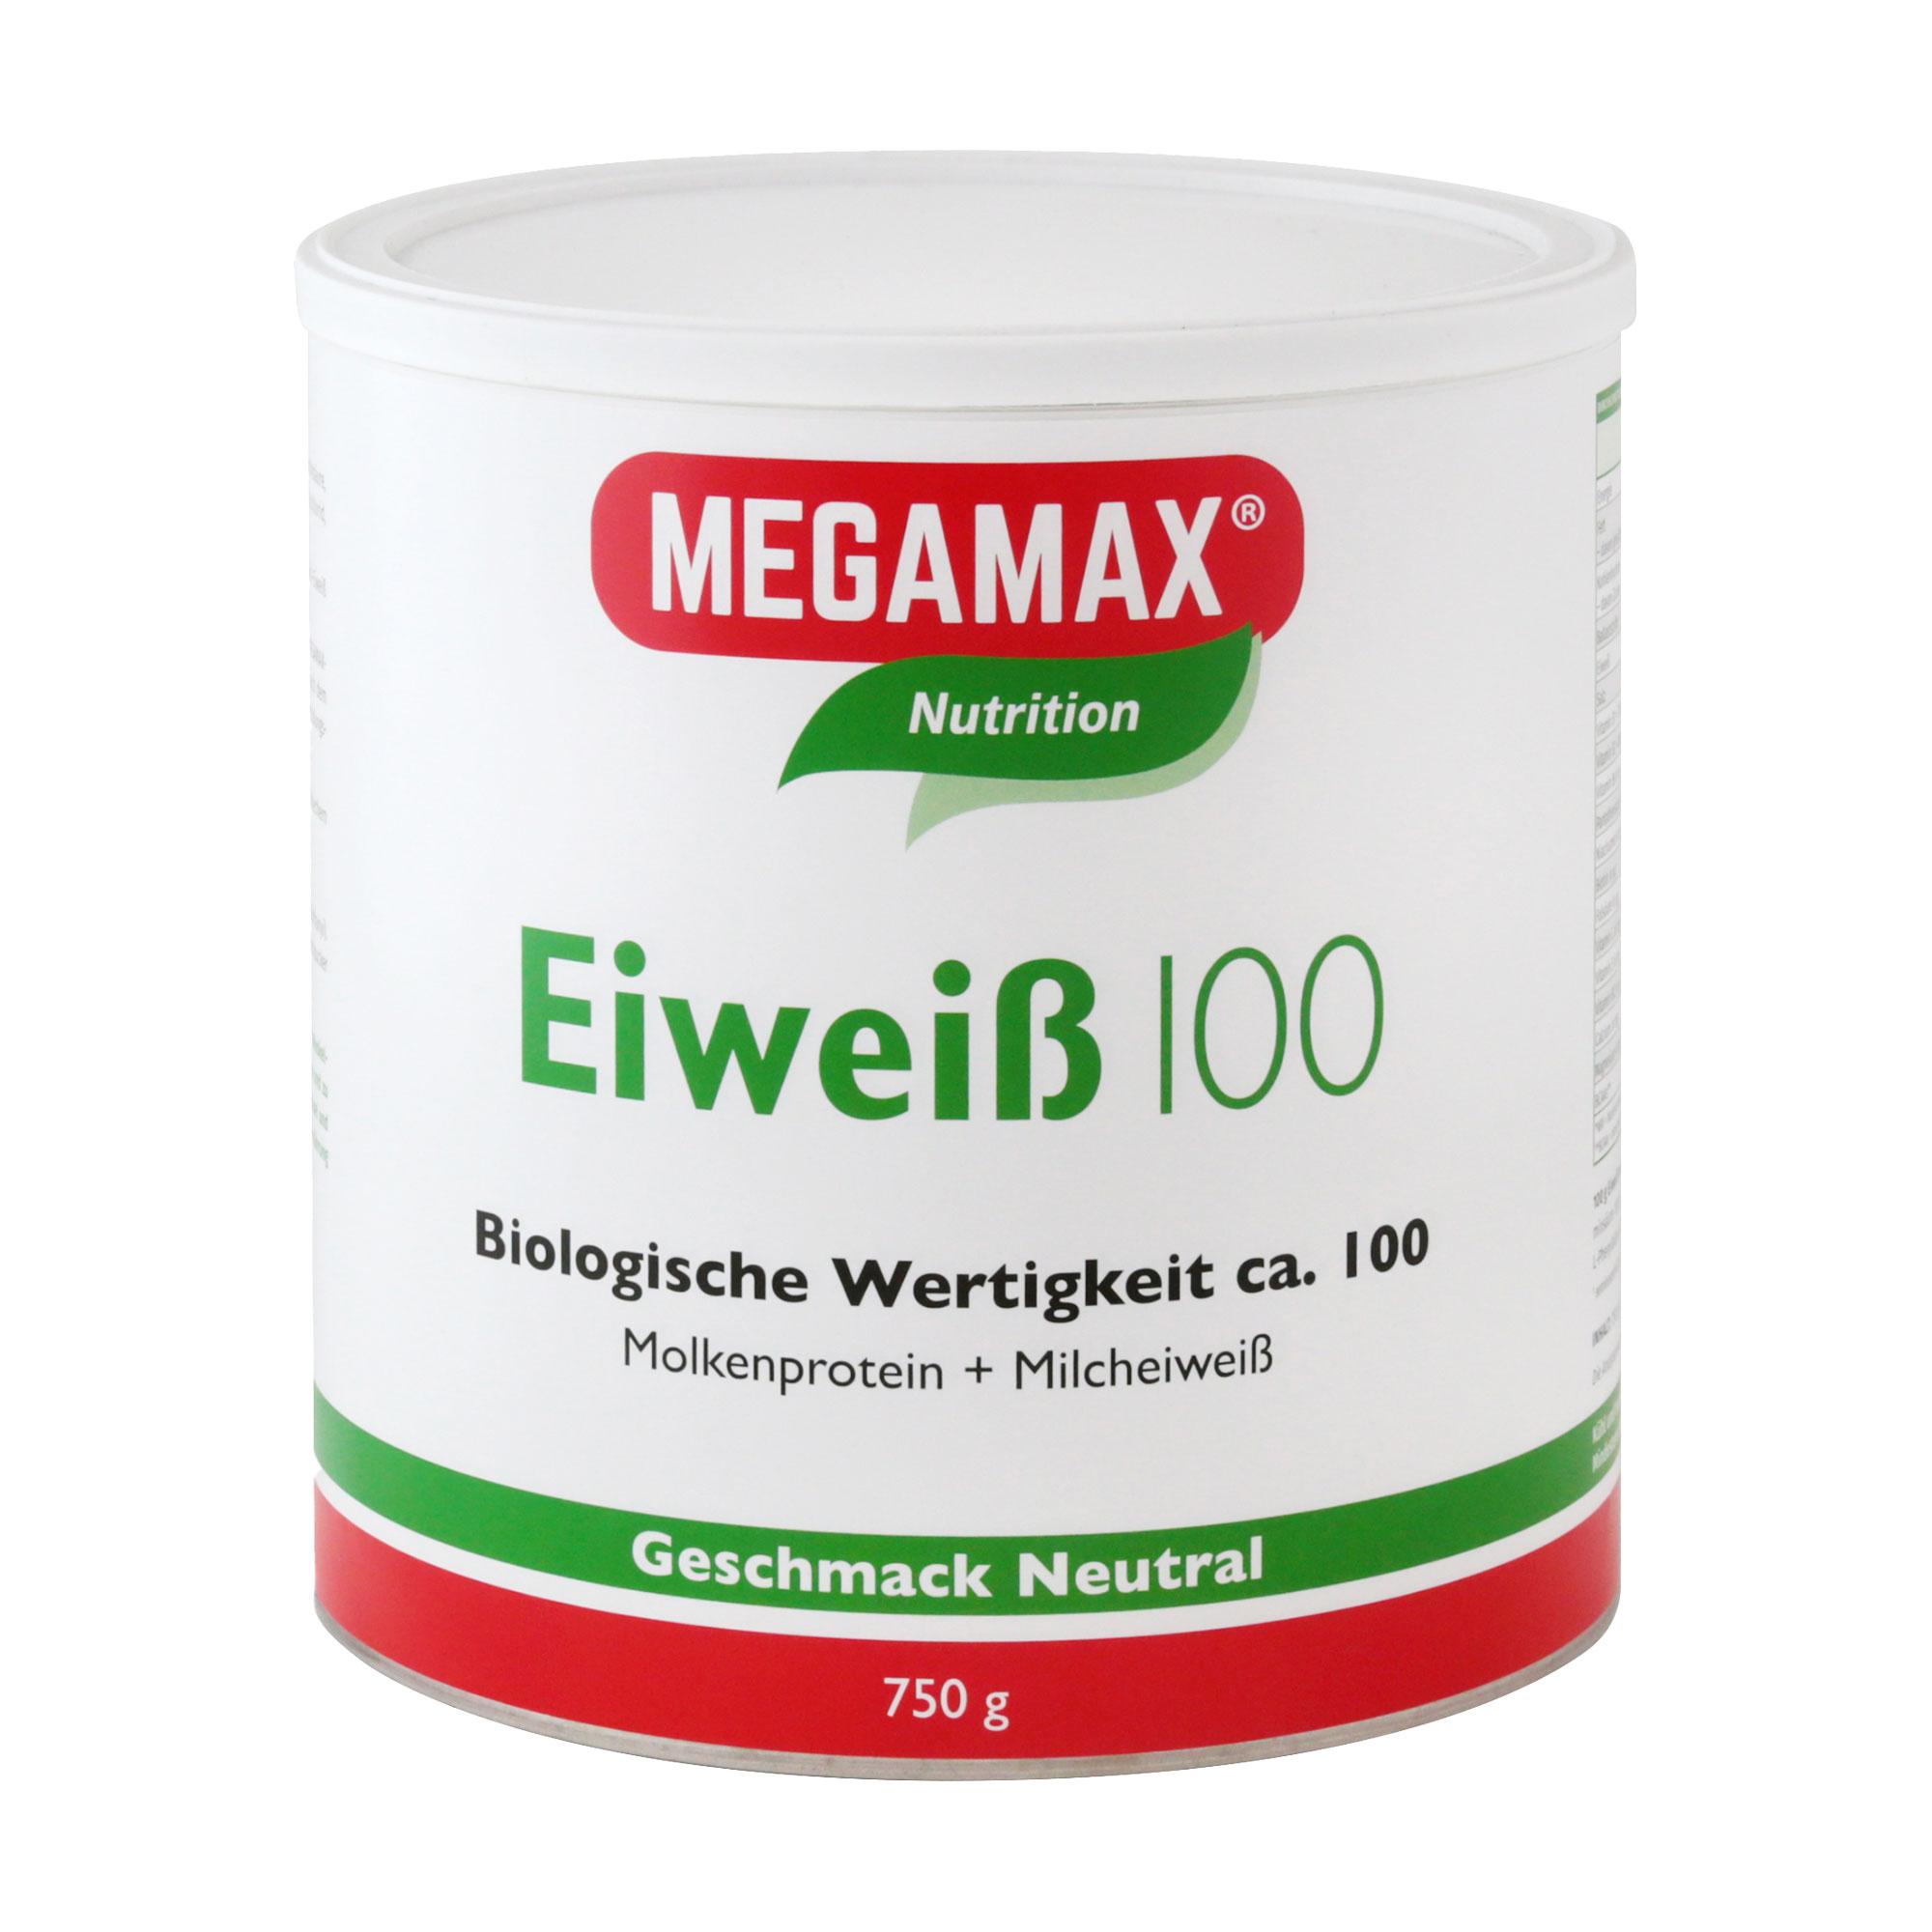 MegaMax Eiweiß 100 Neutral